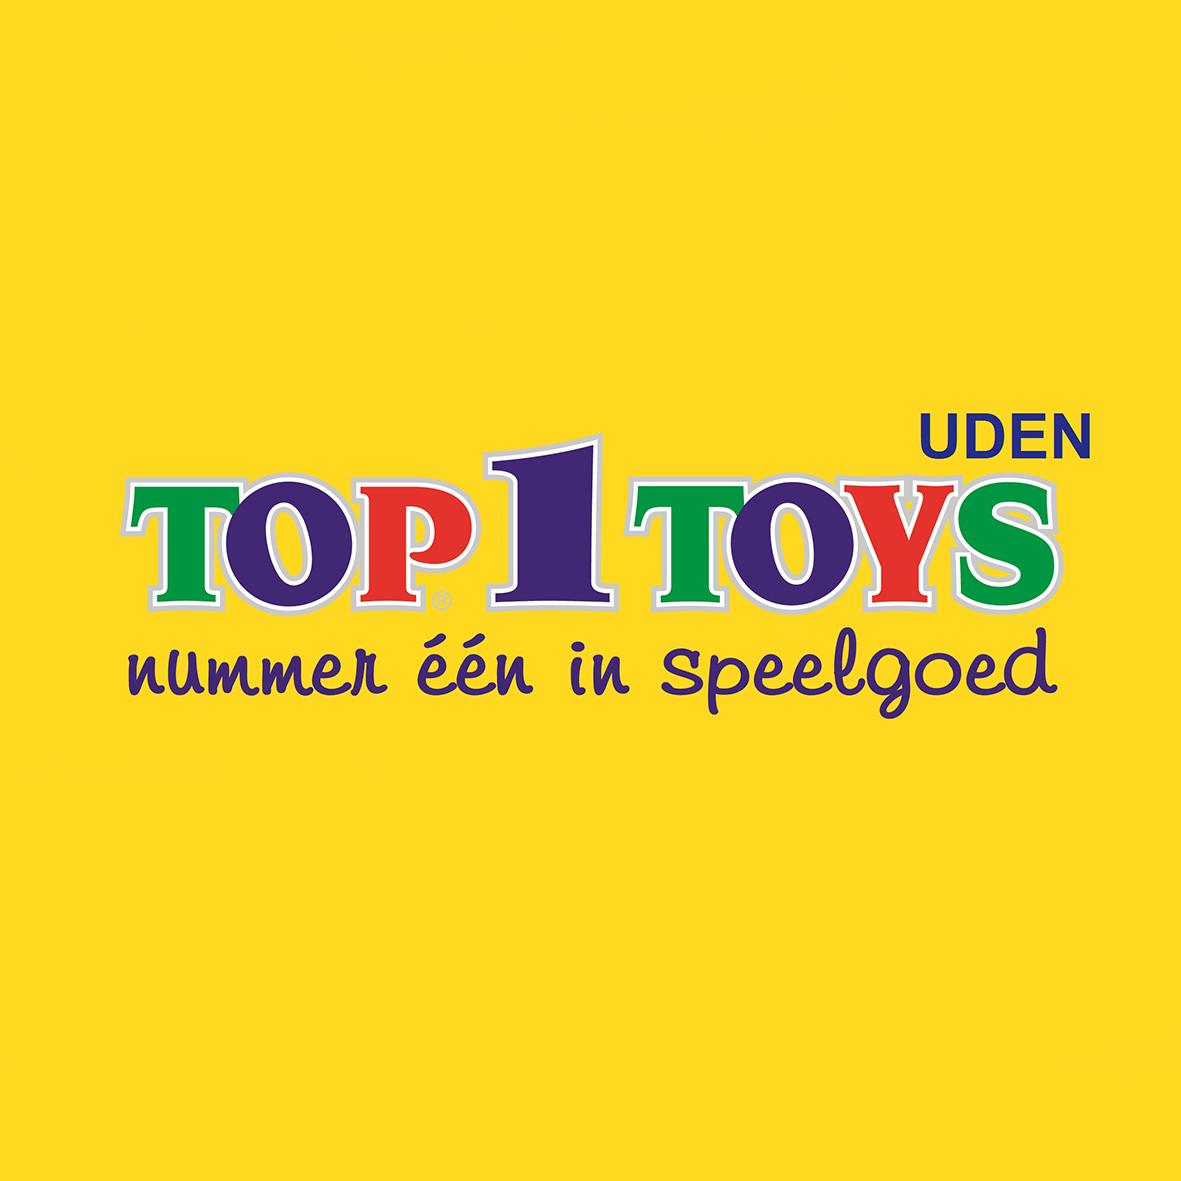 Top_1_Toys_Uden